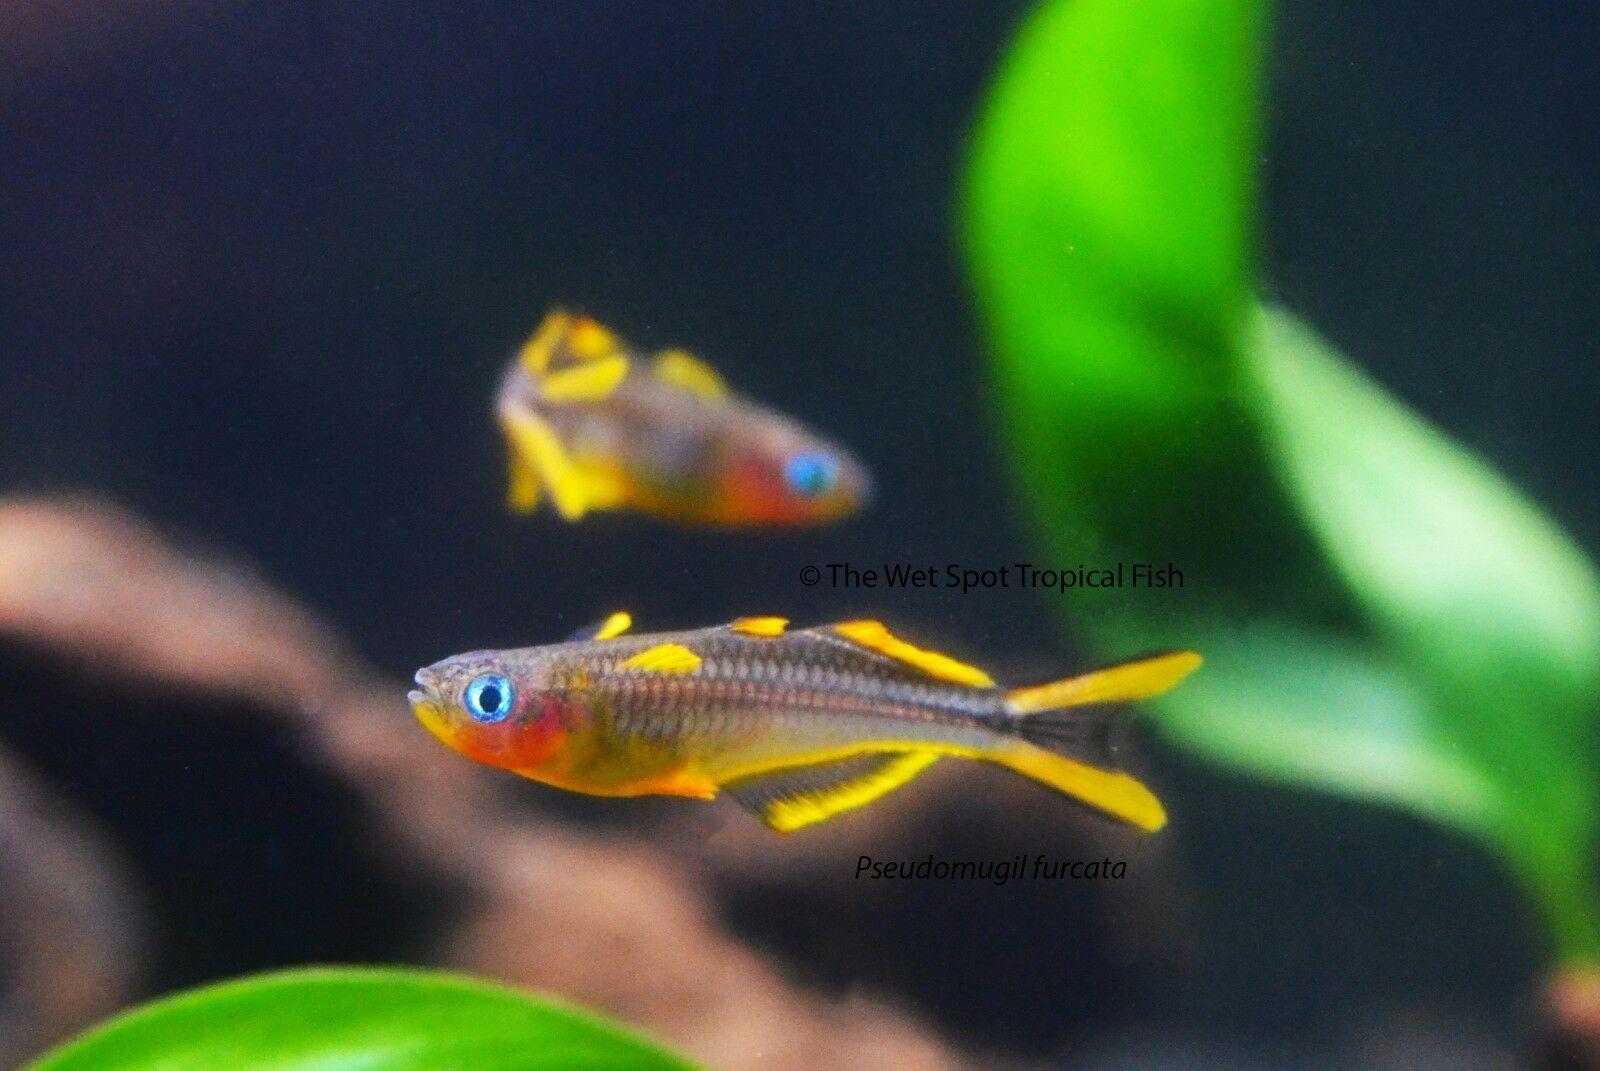 Forktail Blue Eye Rainbowfish Tr Pseudomugil Furcatus 50 81 One Day Shipping In 2020 Aquarium Fish Fish Tropical Freshwater Fish